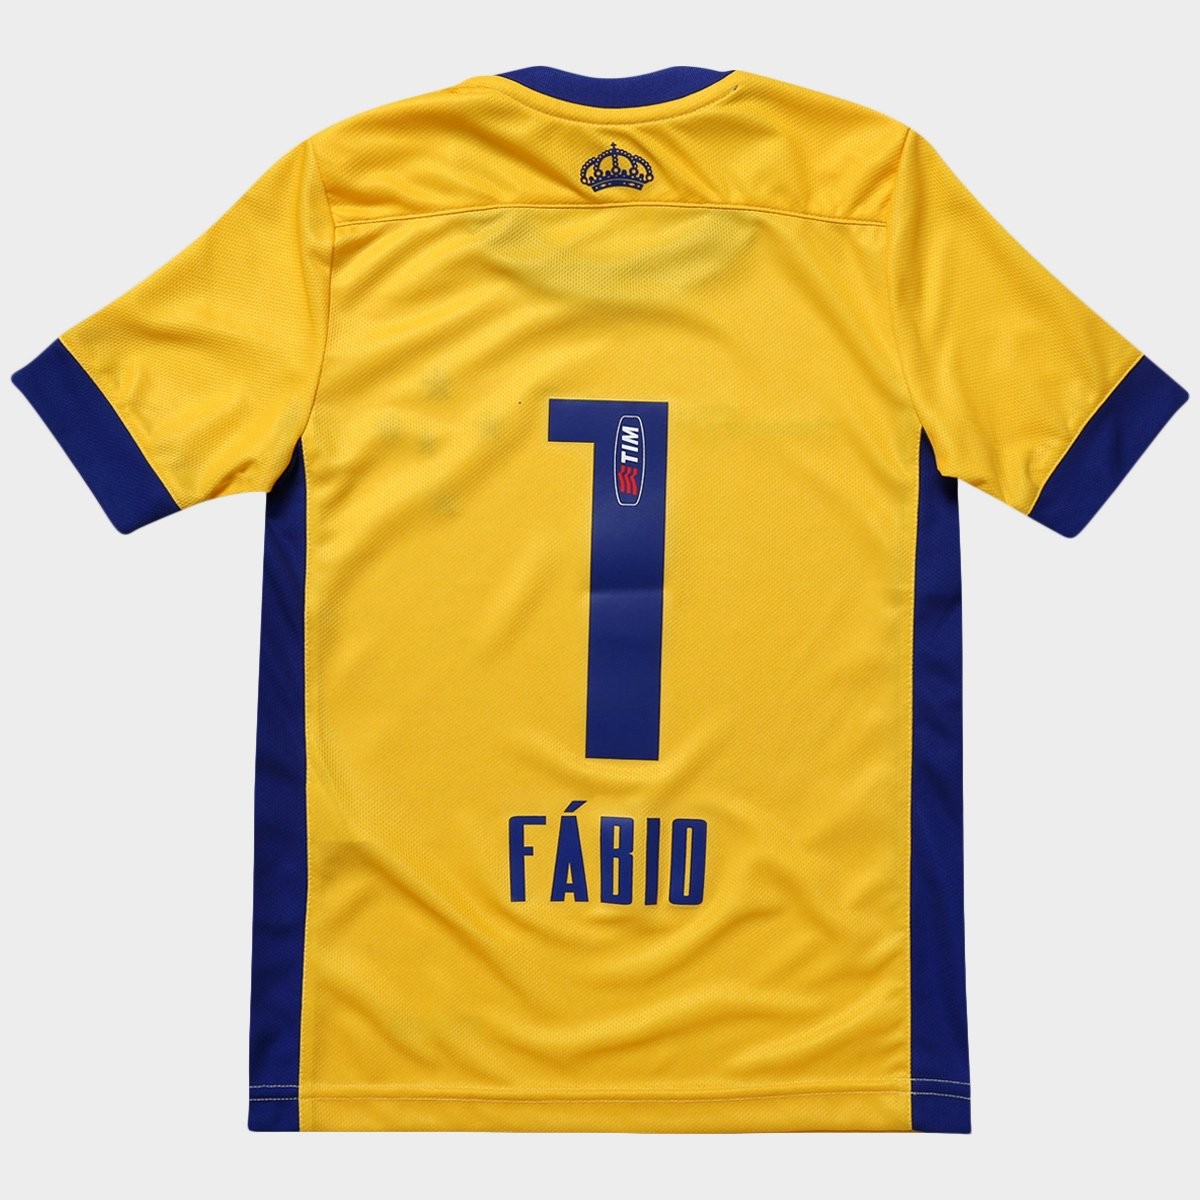 9d799066d1d34 Camisa Penalty Cruzeiro Goleiro I 2015 nº 1 Juvenil - Compre Agora ...